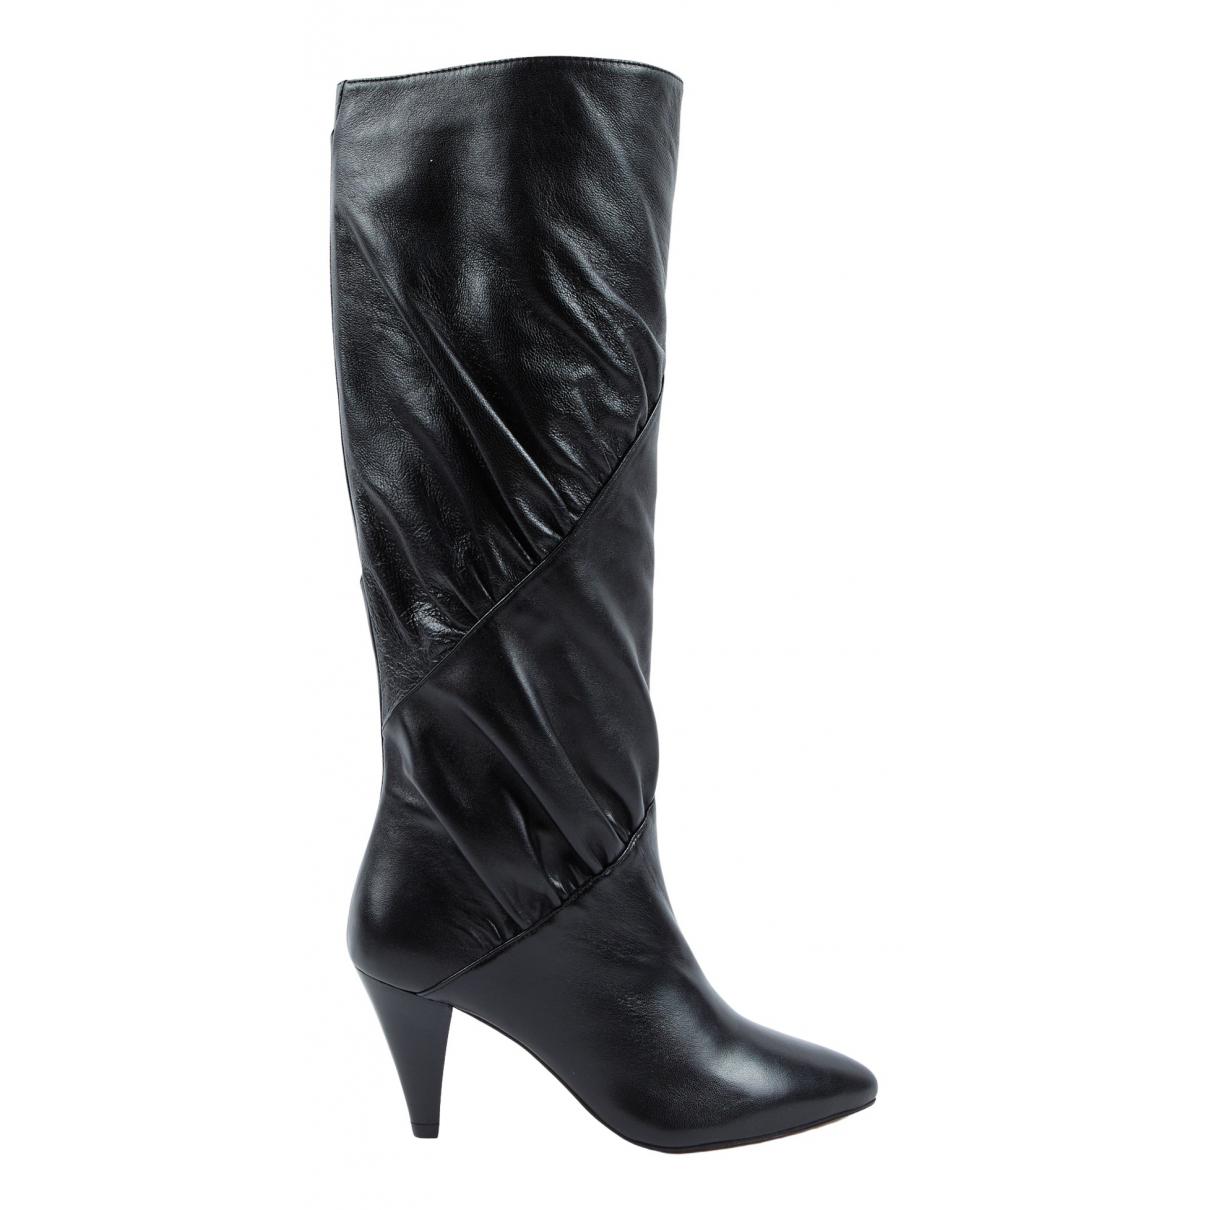 Ba&sh N Black Leather Boots for Women 36 EU